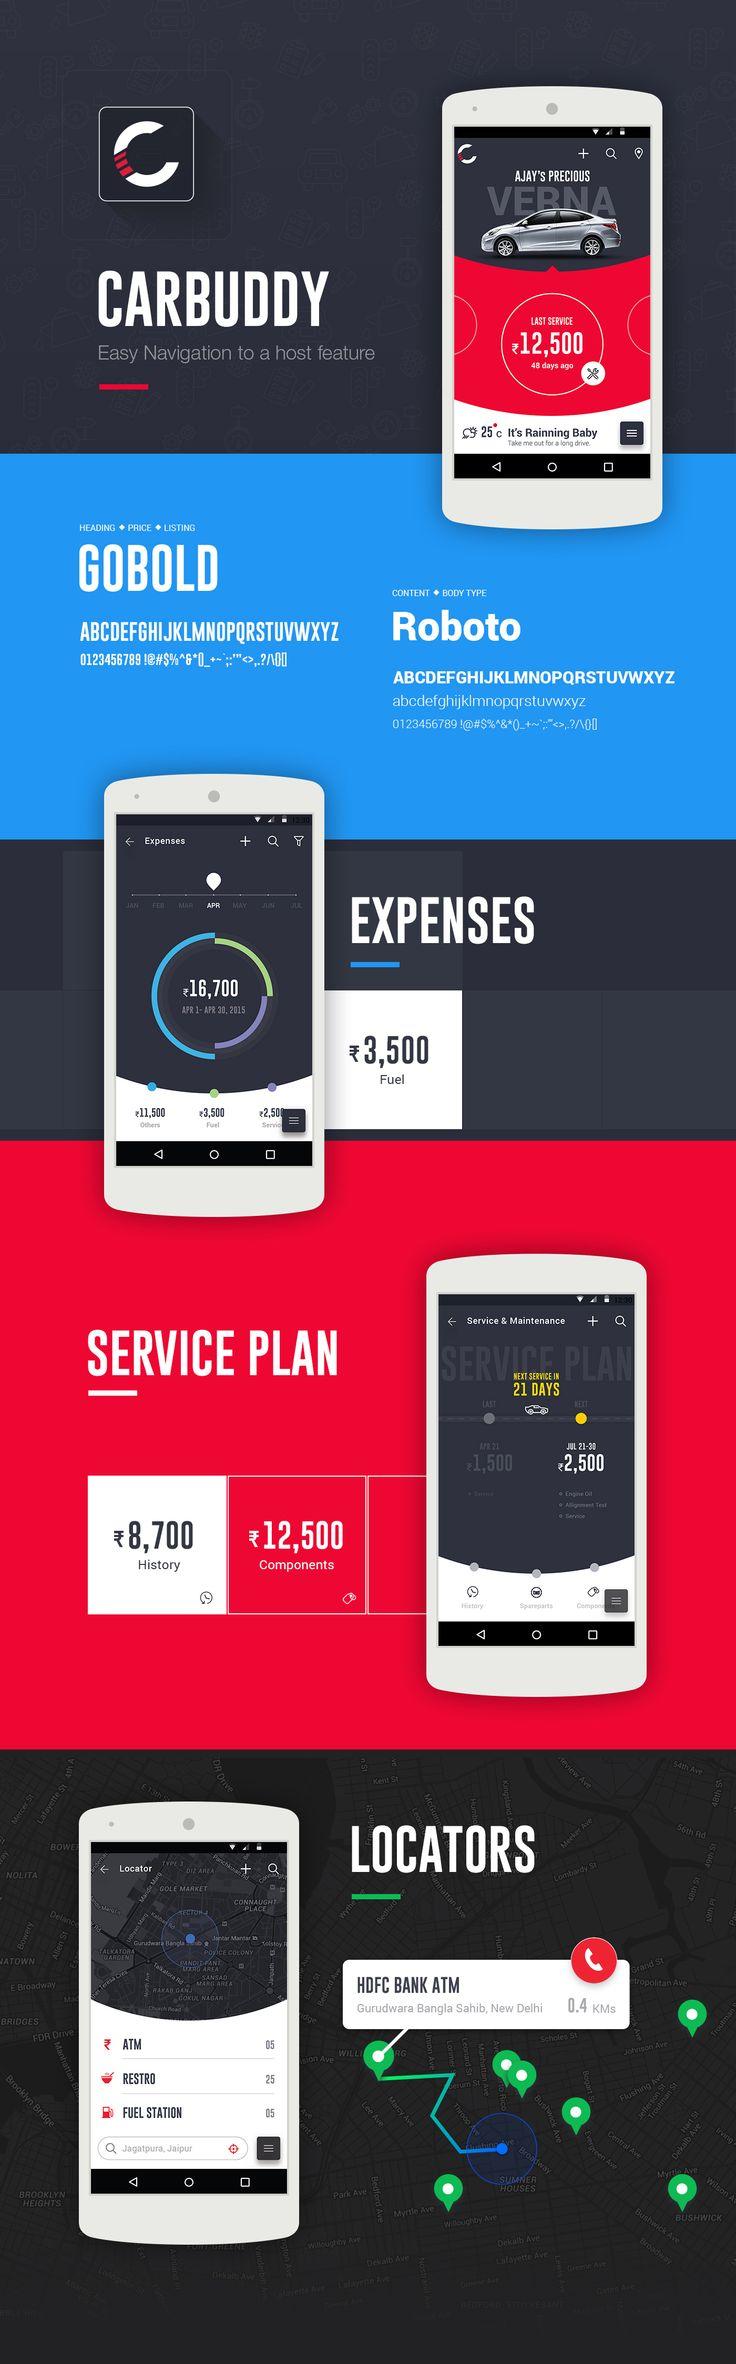 Car service concept. https://www.behance.net/gallery/29230817/Car-Buddy-material-UI-app-v1